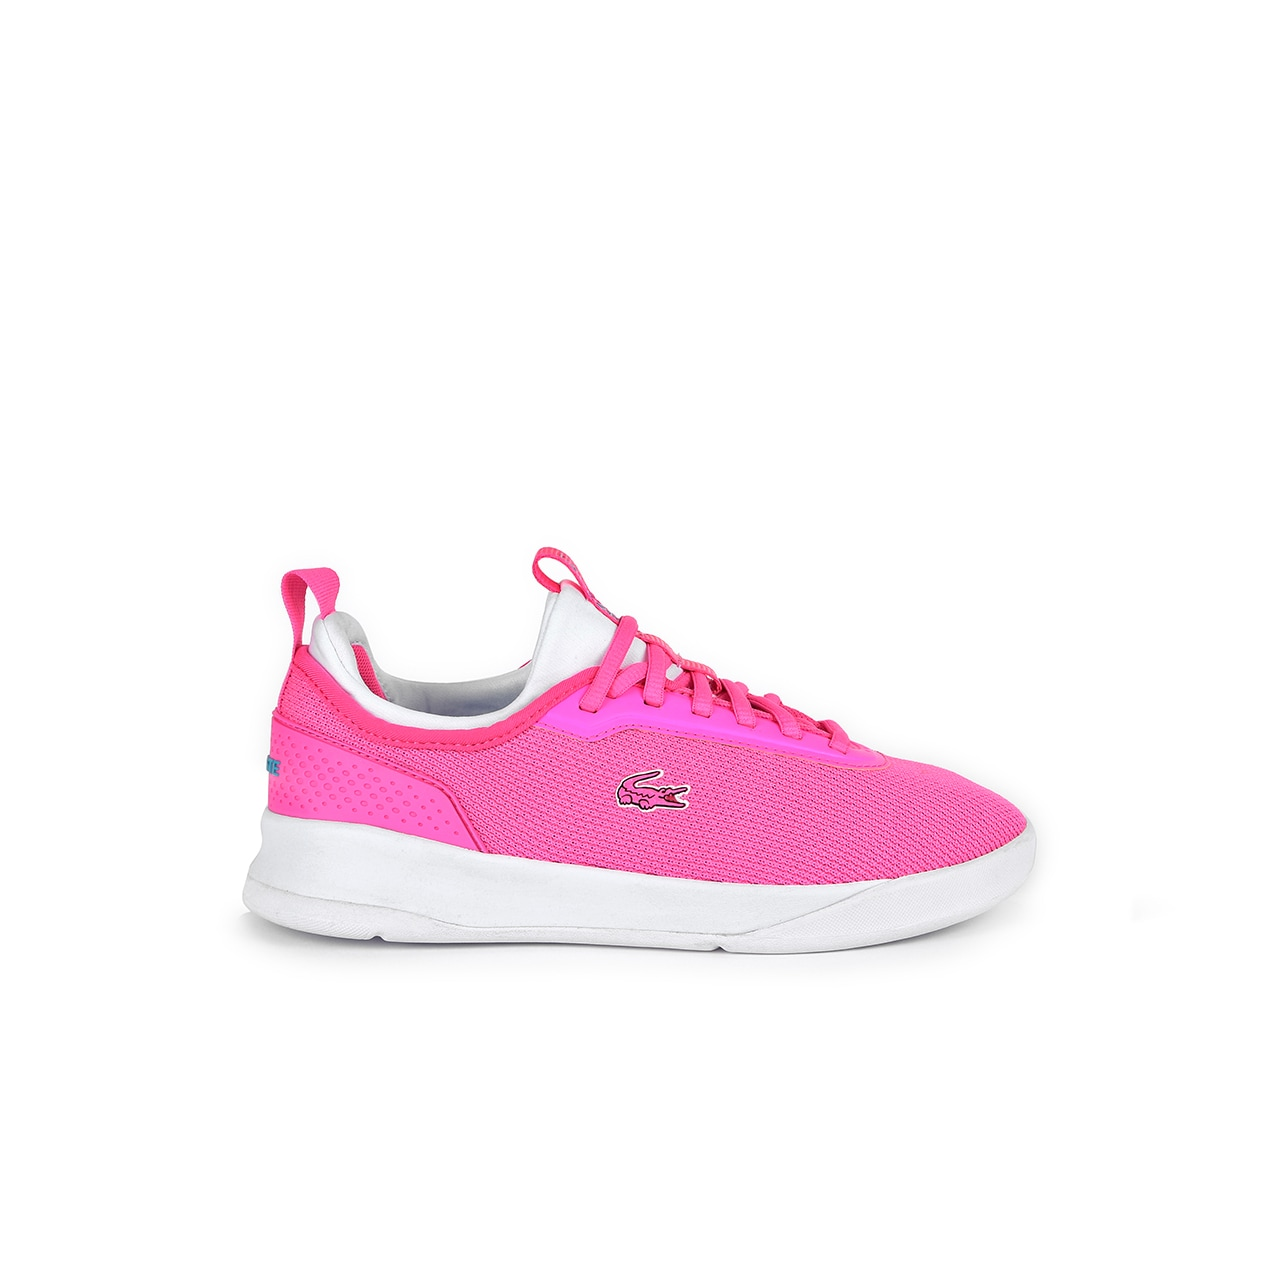 Women's LT Spirit Textile Sneakers